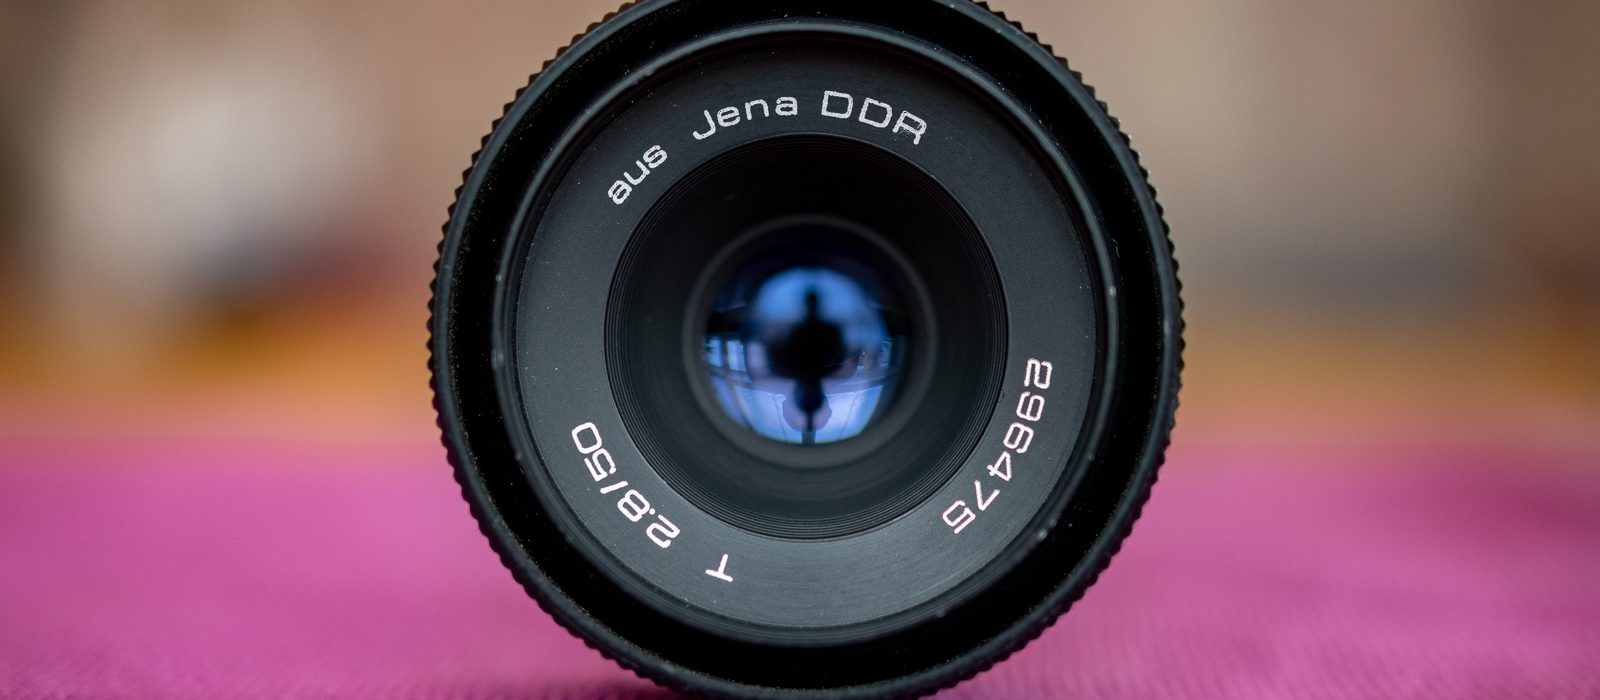 aus Jena DDR 50mm f/2.8   Norbert Eder Photography